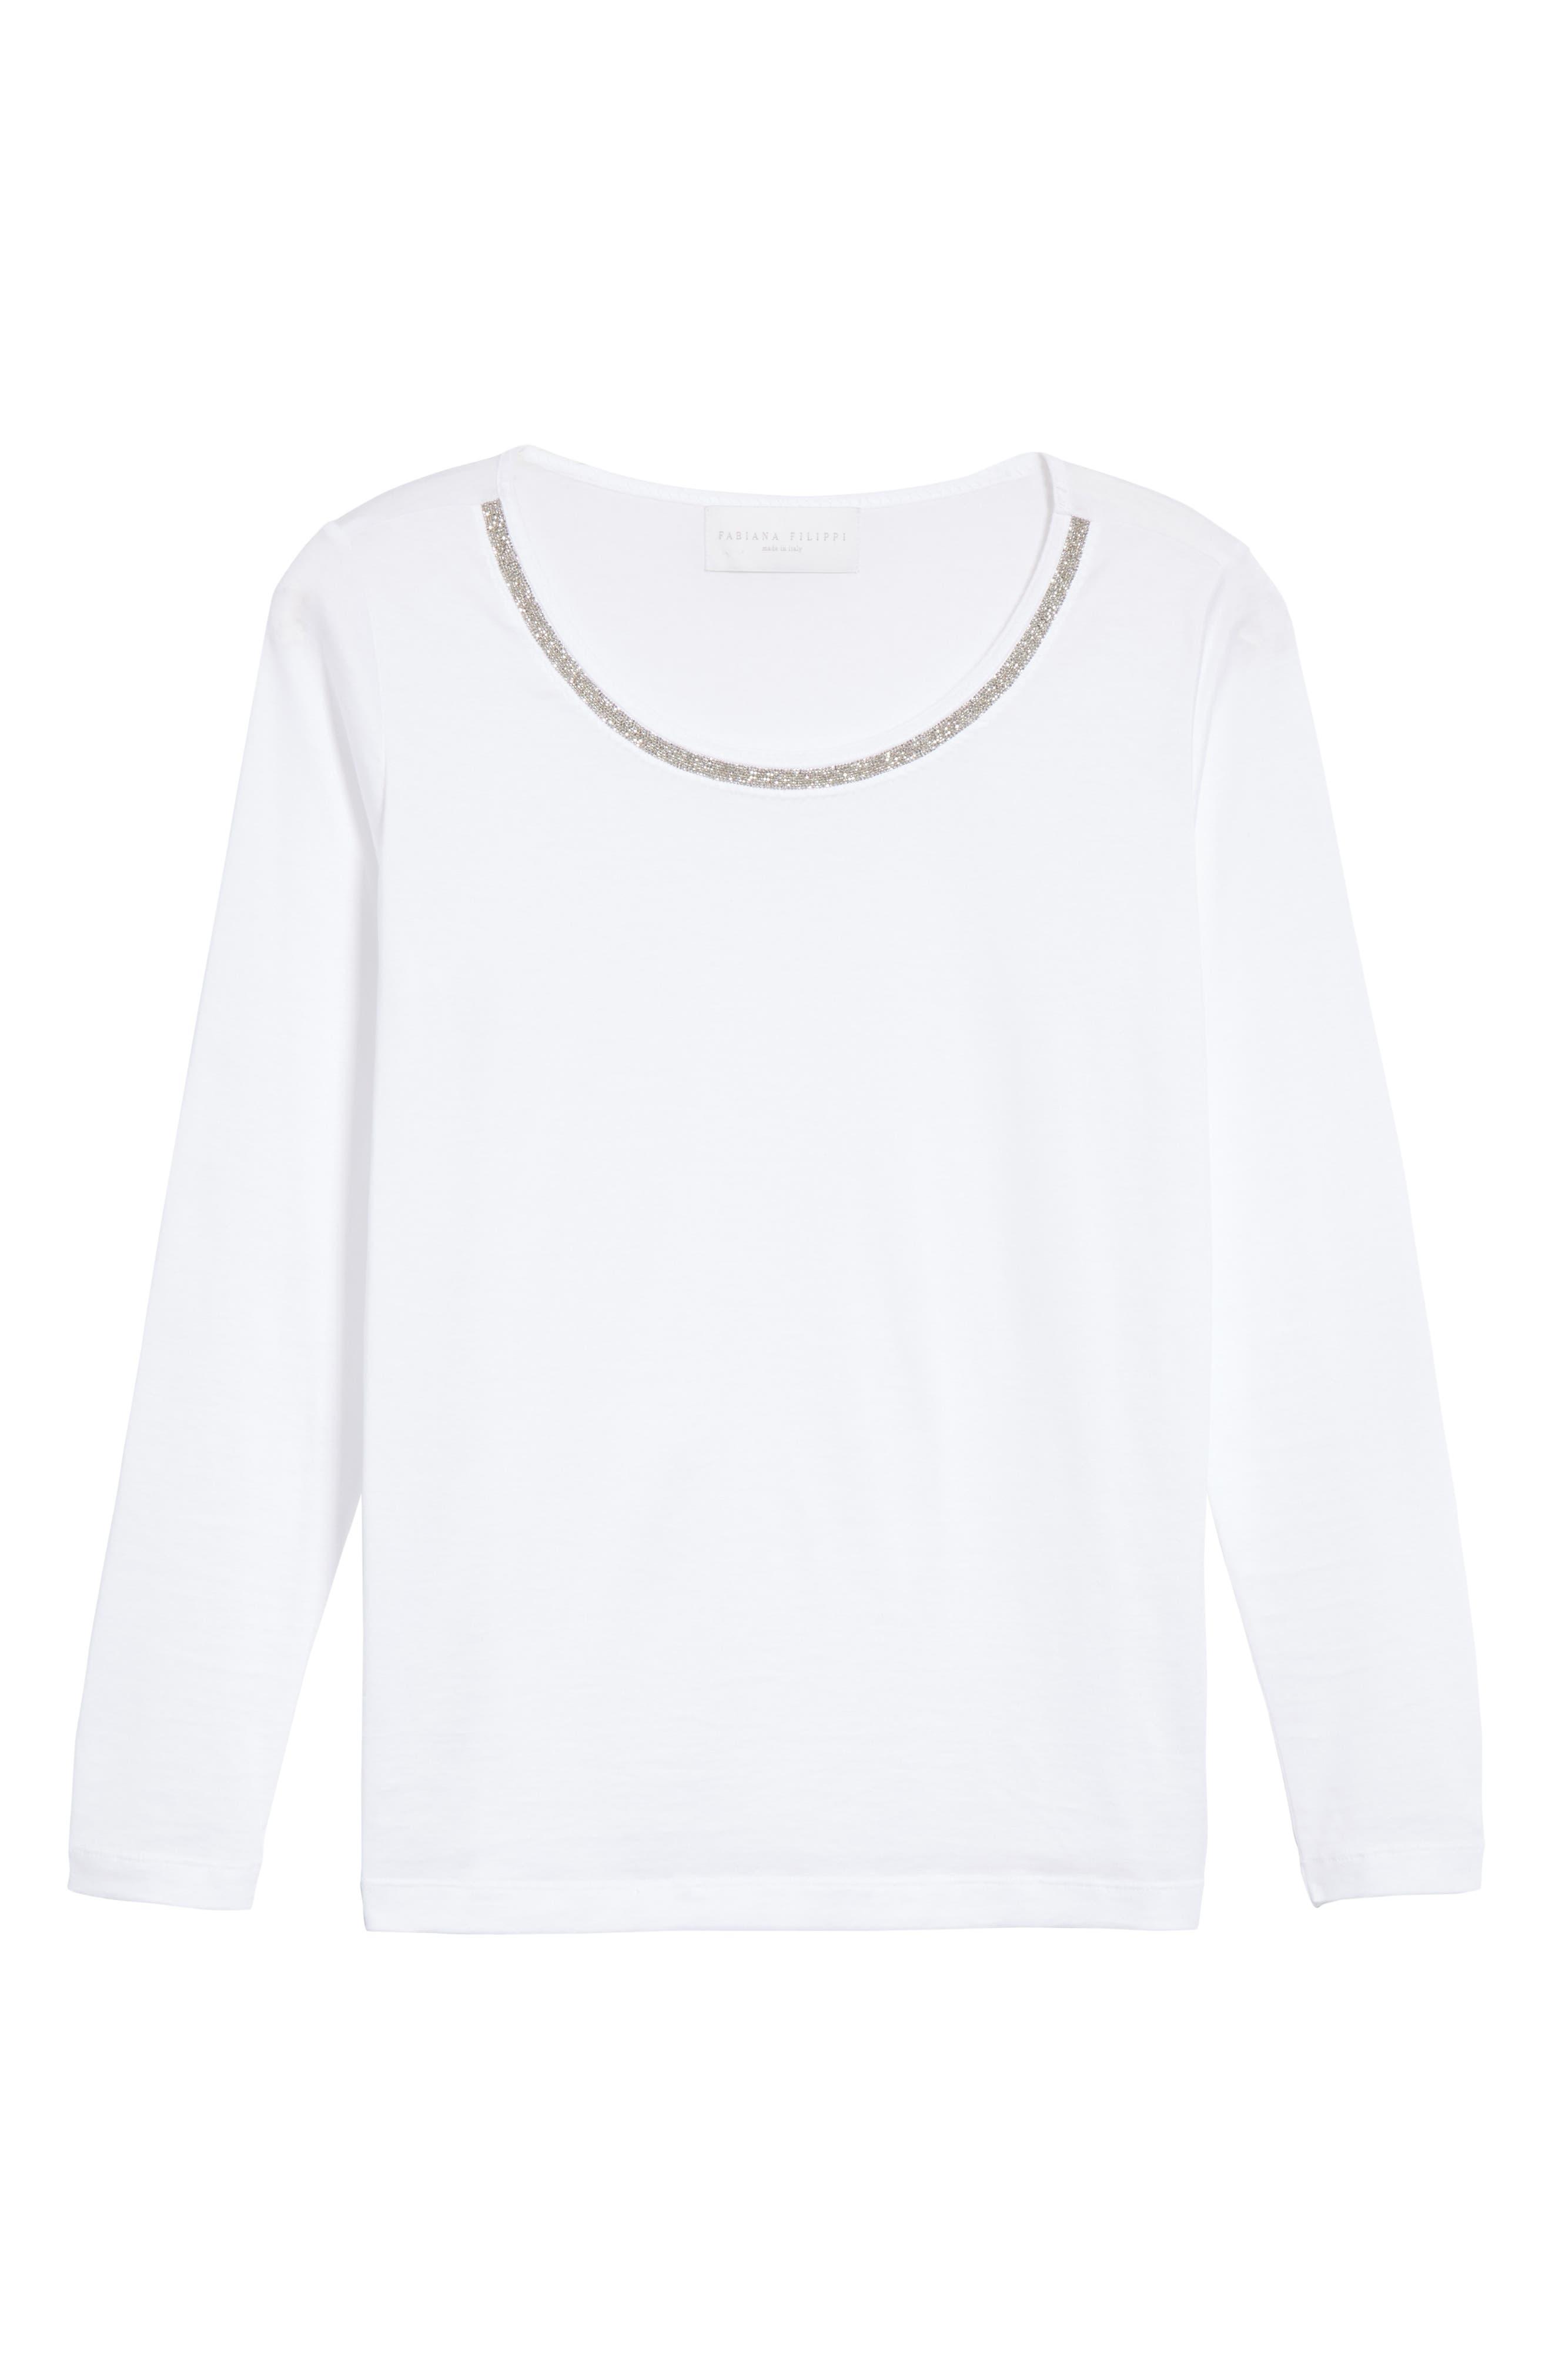 FABIANA FILIPPI, Chain Trim Jersey Top, Alternate thumbnail 6, color, WHITE